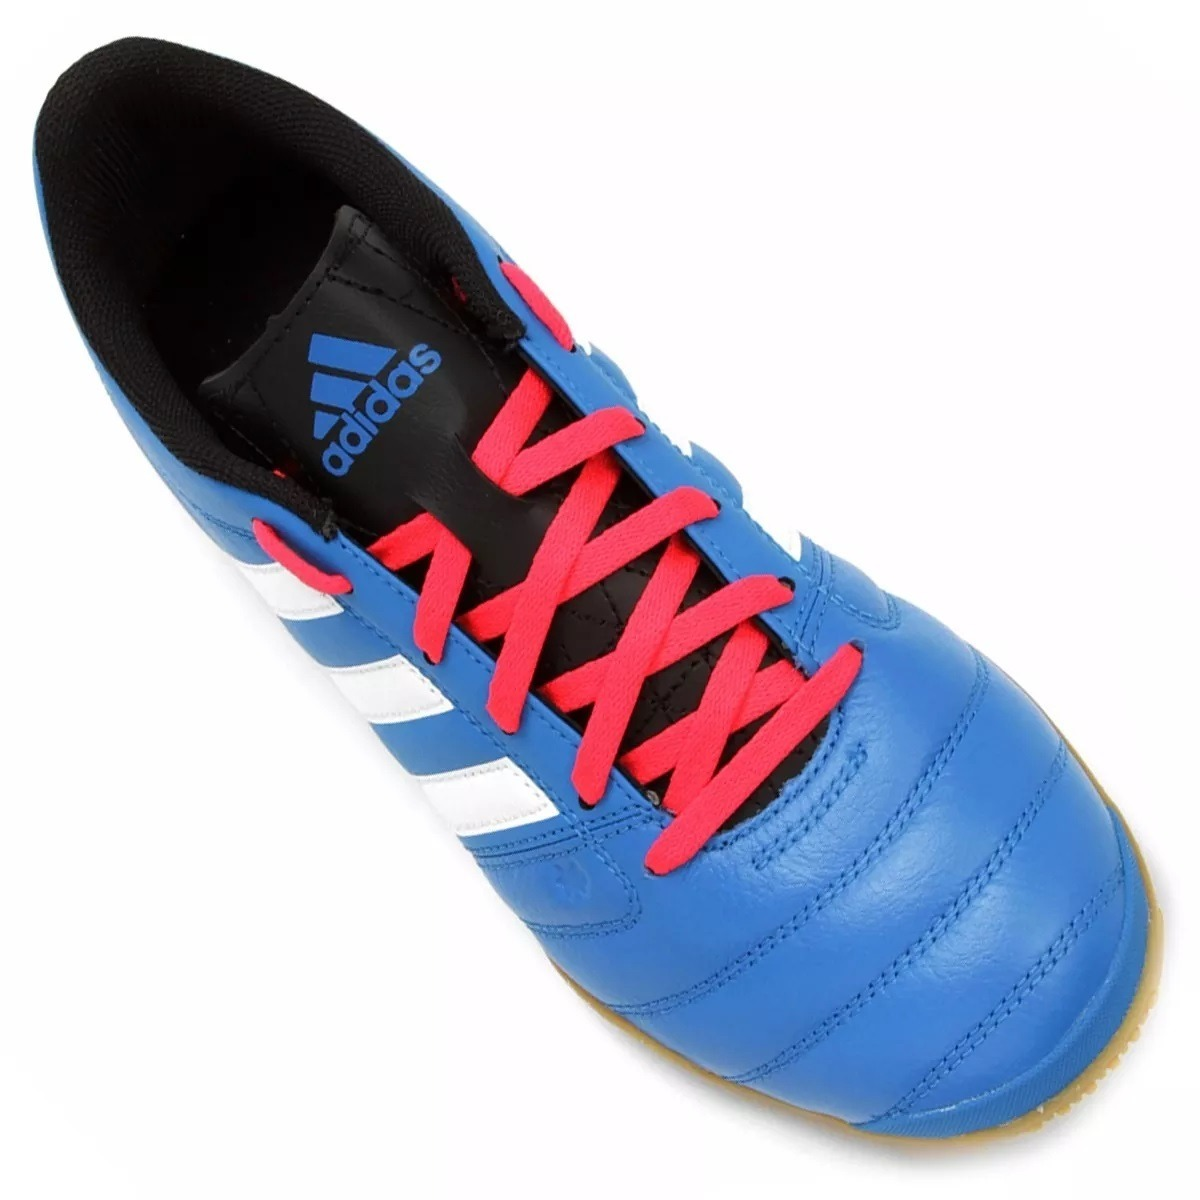 chuteira adidas gloro 16.2 - futsal - original. Carregando zoom. eb88d68e0a8bb